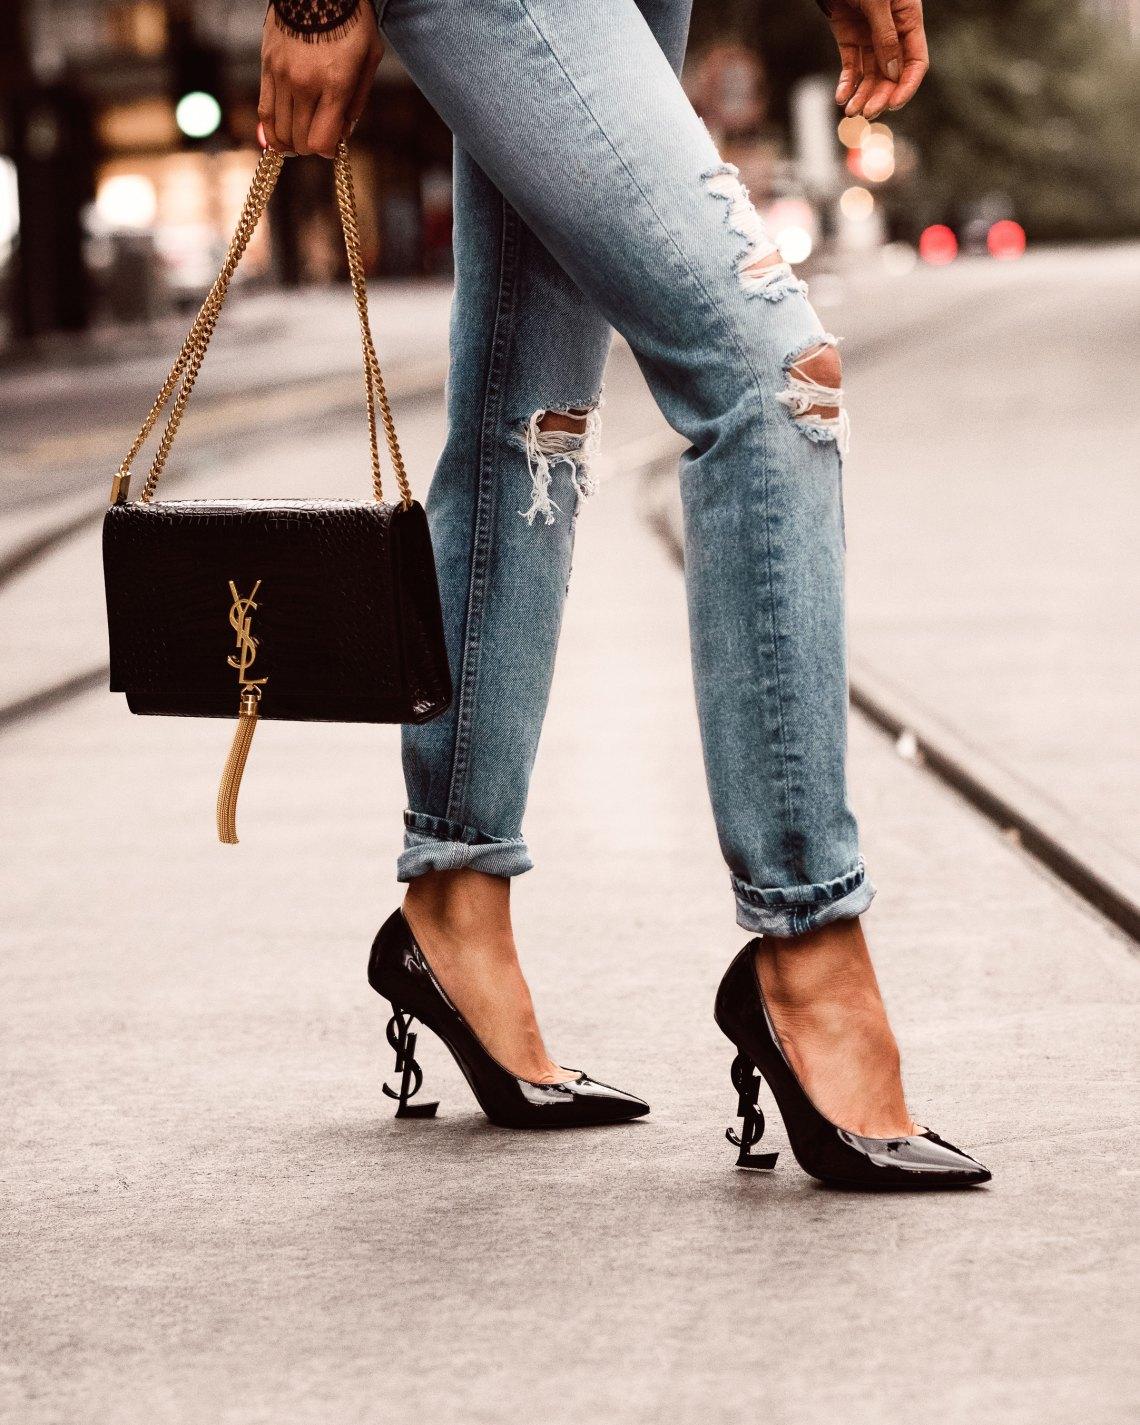 micah-gianneli-australian-melbourne-fashion-blogger-influencer-photography-street-style-vogue-editorial-luisaviaroma-ysl-saint-laurent-opyum-kate-bag-revolve-nbd-grlfrnd-designer-luxury-5